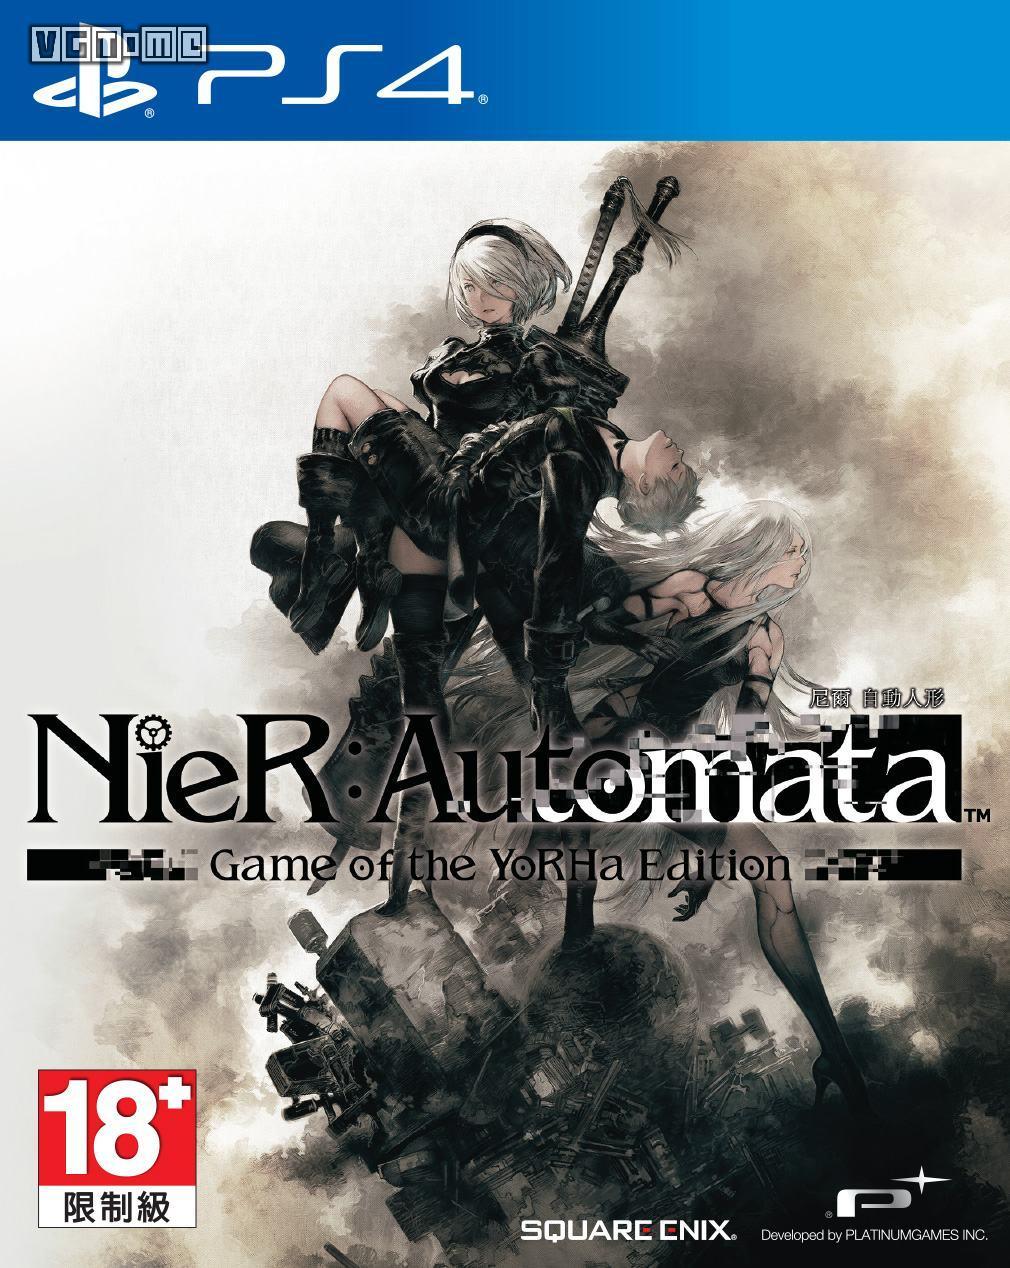 PS4《尼尔 机械军团 寄叶版》中文版将于2月21日发售